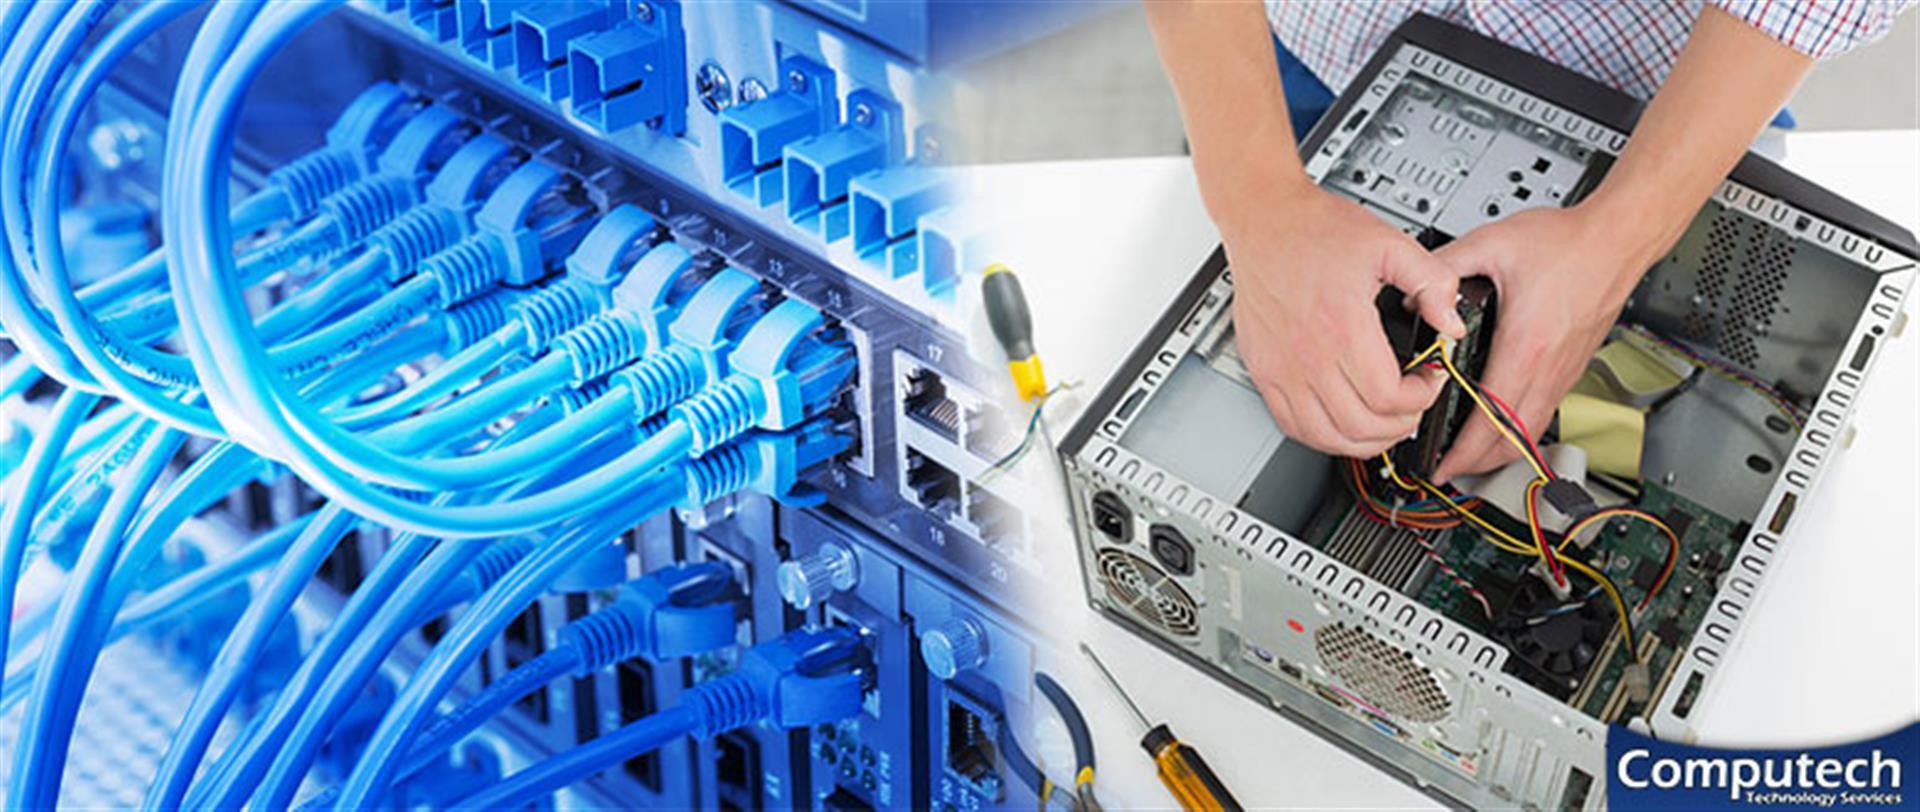 Hamilton Alabama On Site Computer PC & Printer Repair, Network, Telecom & Data Low Voltage Cabling Solutions